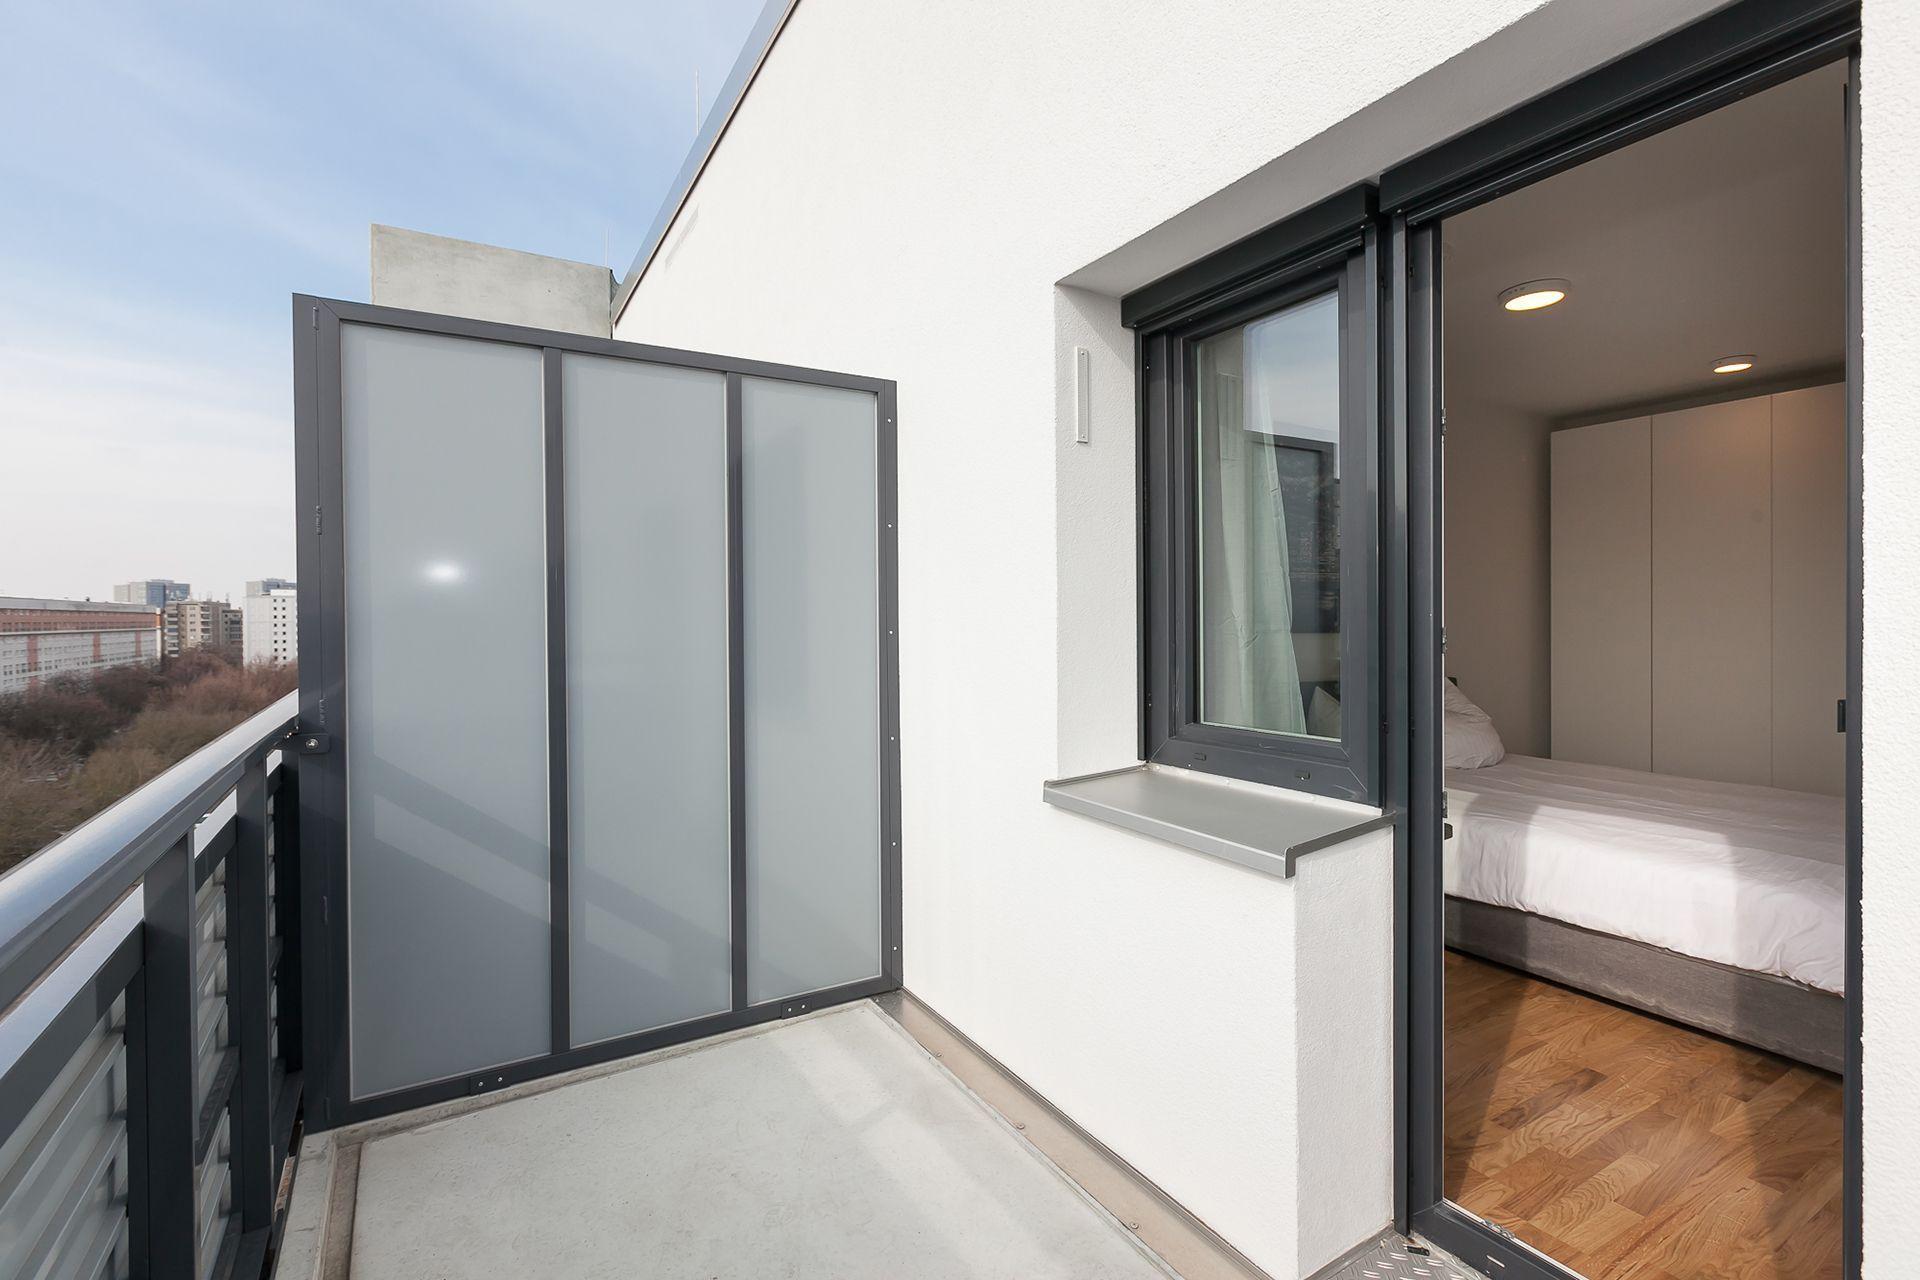 1 Bedroom - Small apartment to rent in Berlin KOEP-KOEP-0306-0